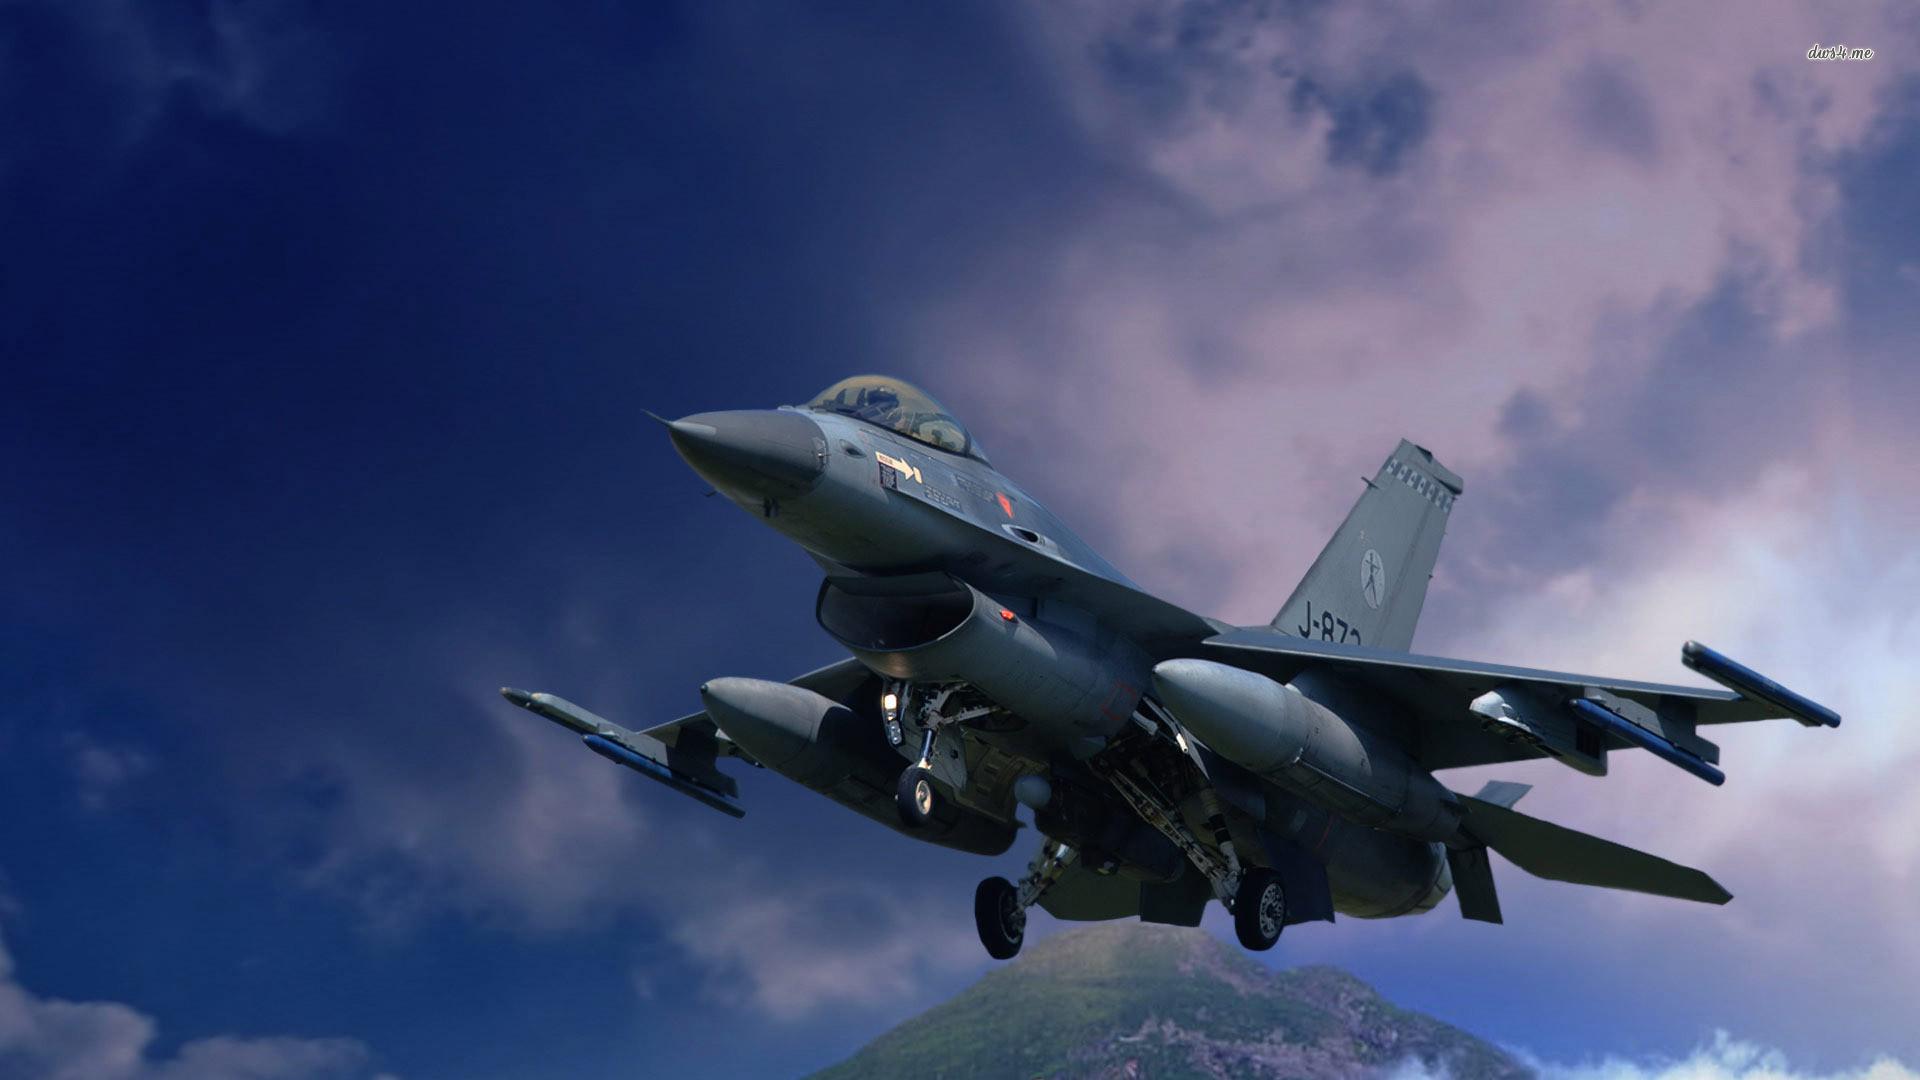 General Dynamics F-16 Fighting Falcon wallpaper – 1198242